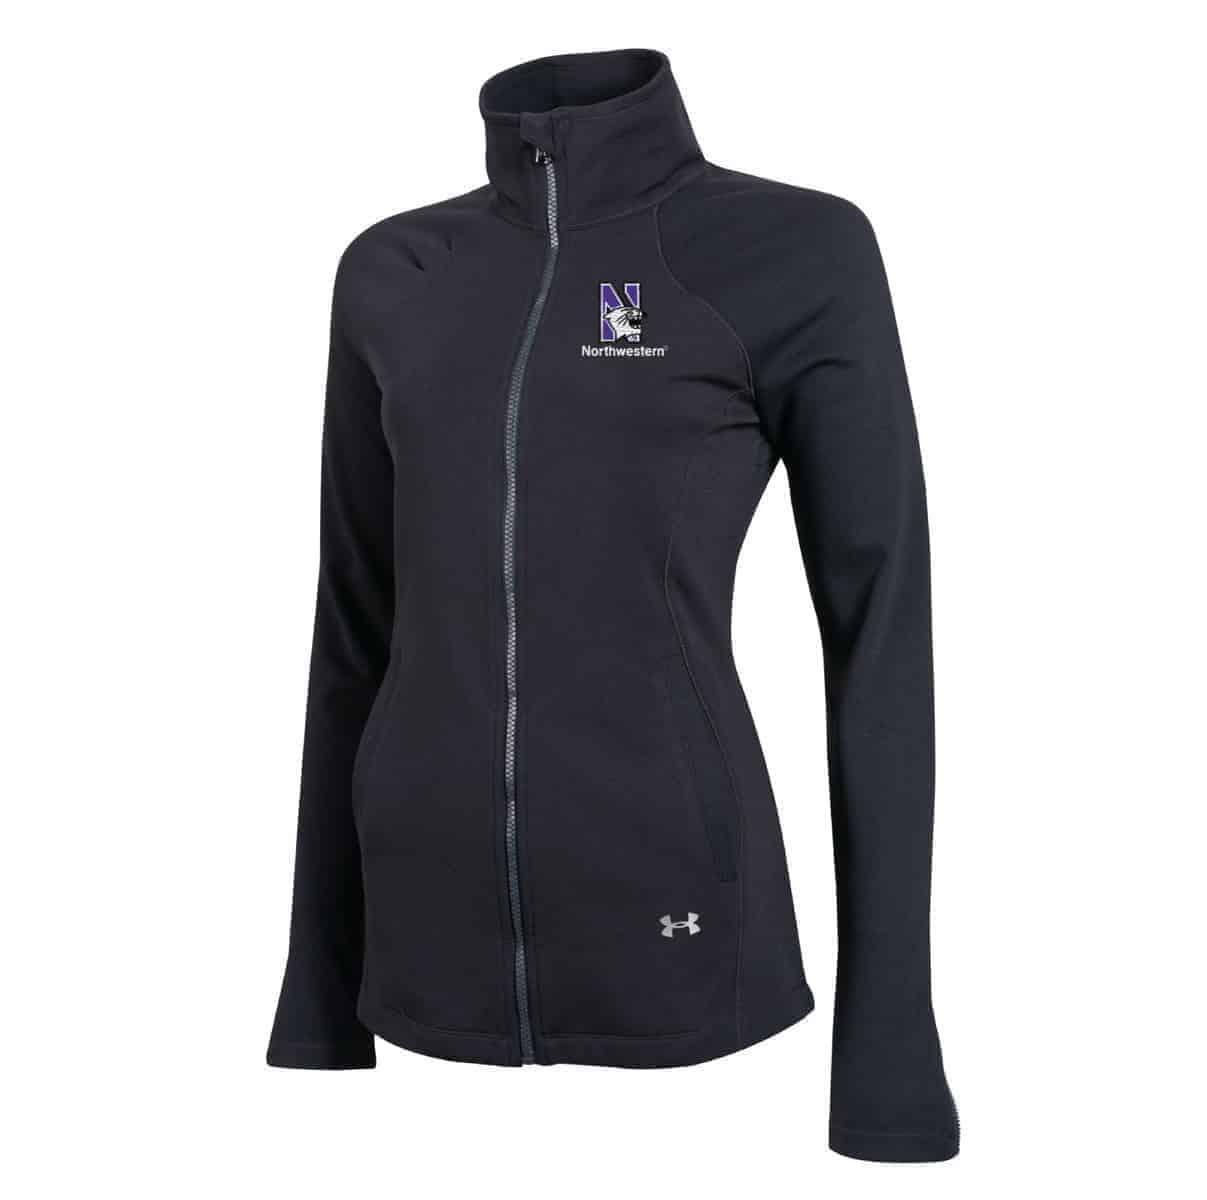 e73a93f0d Northwestern University Wildcats Under Armour Ladies Black Fullzip Light  Weight Jacket